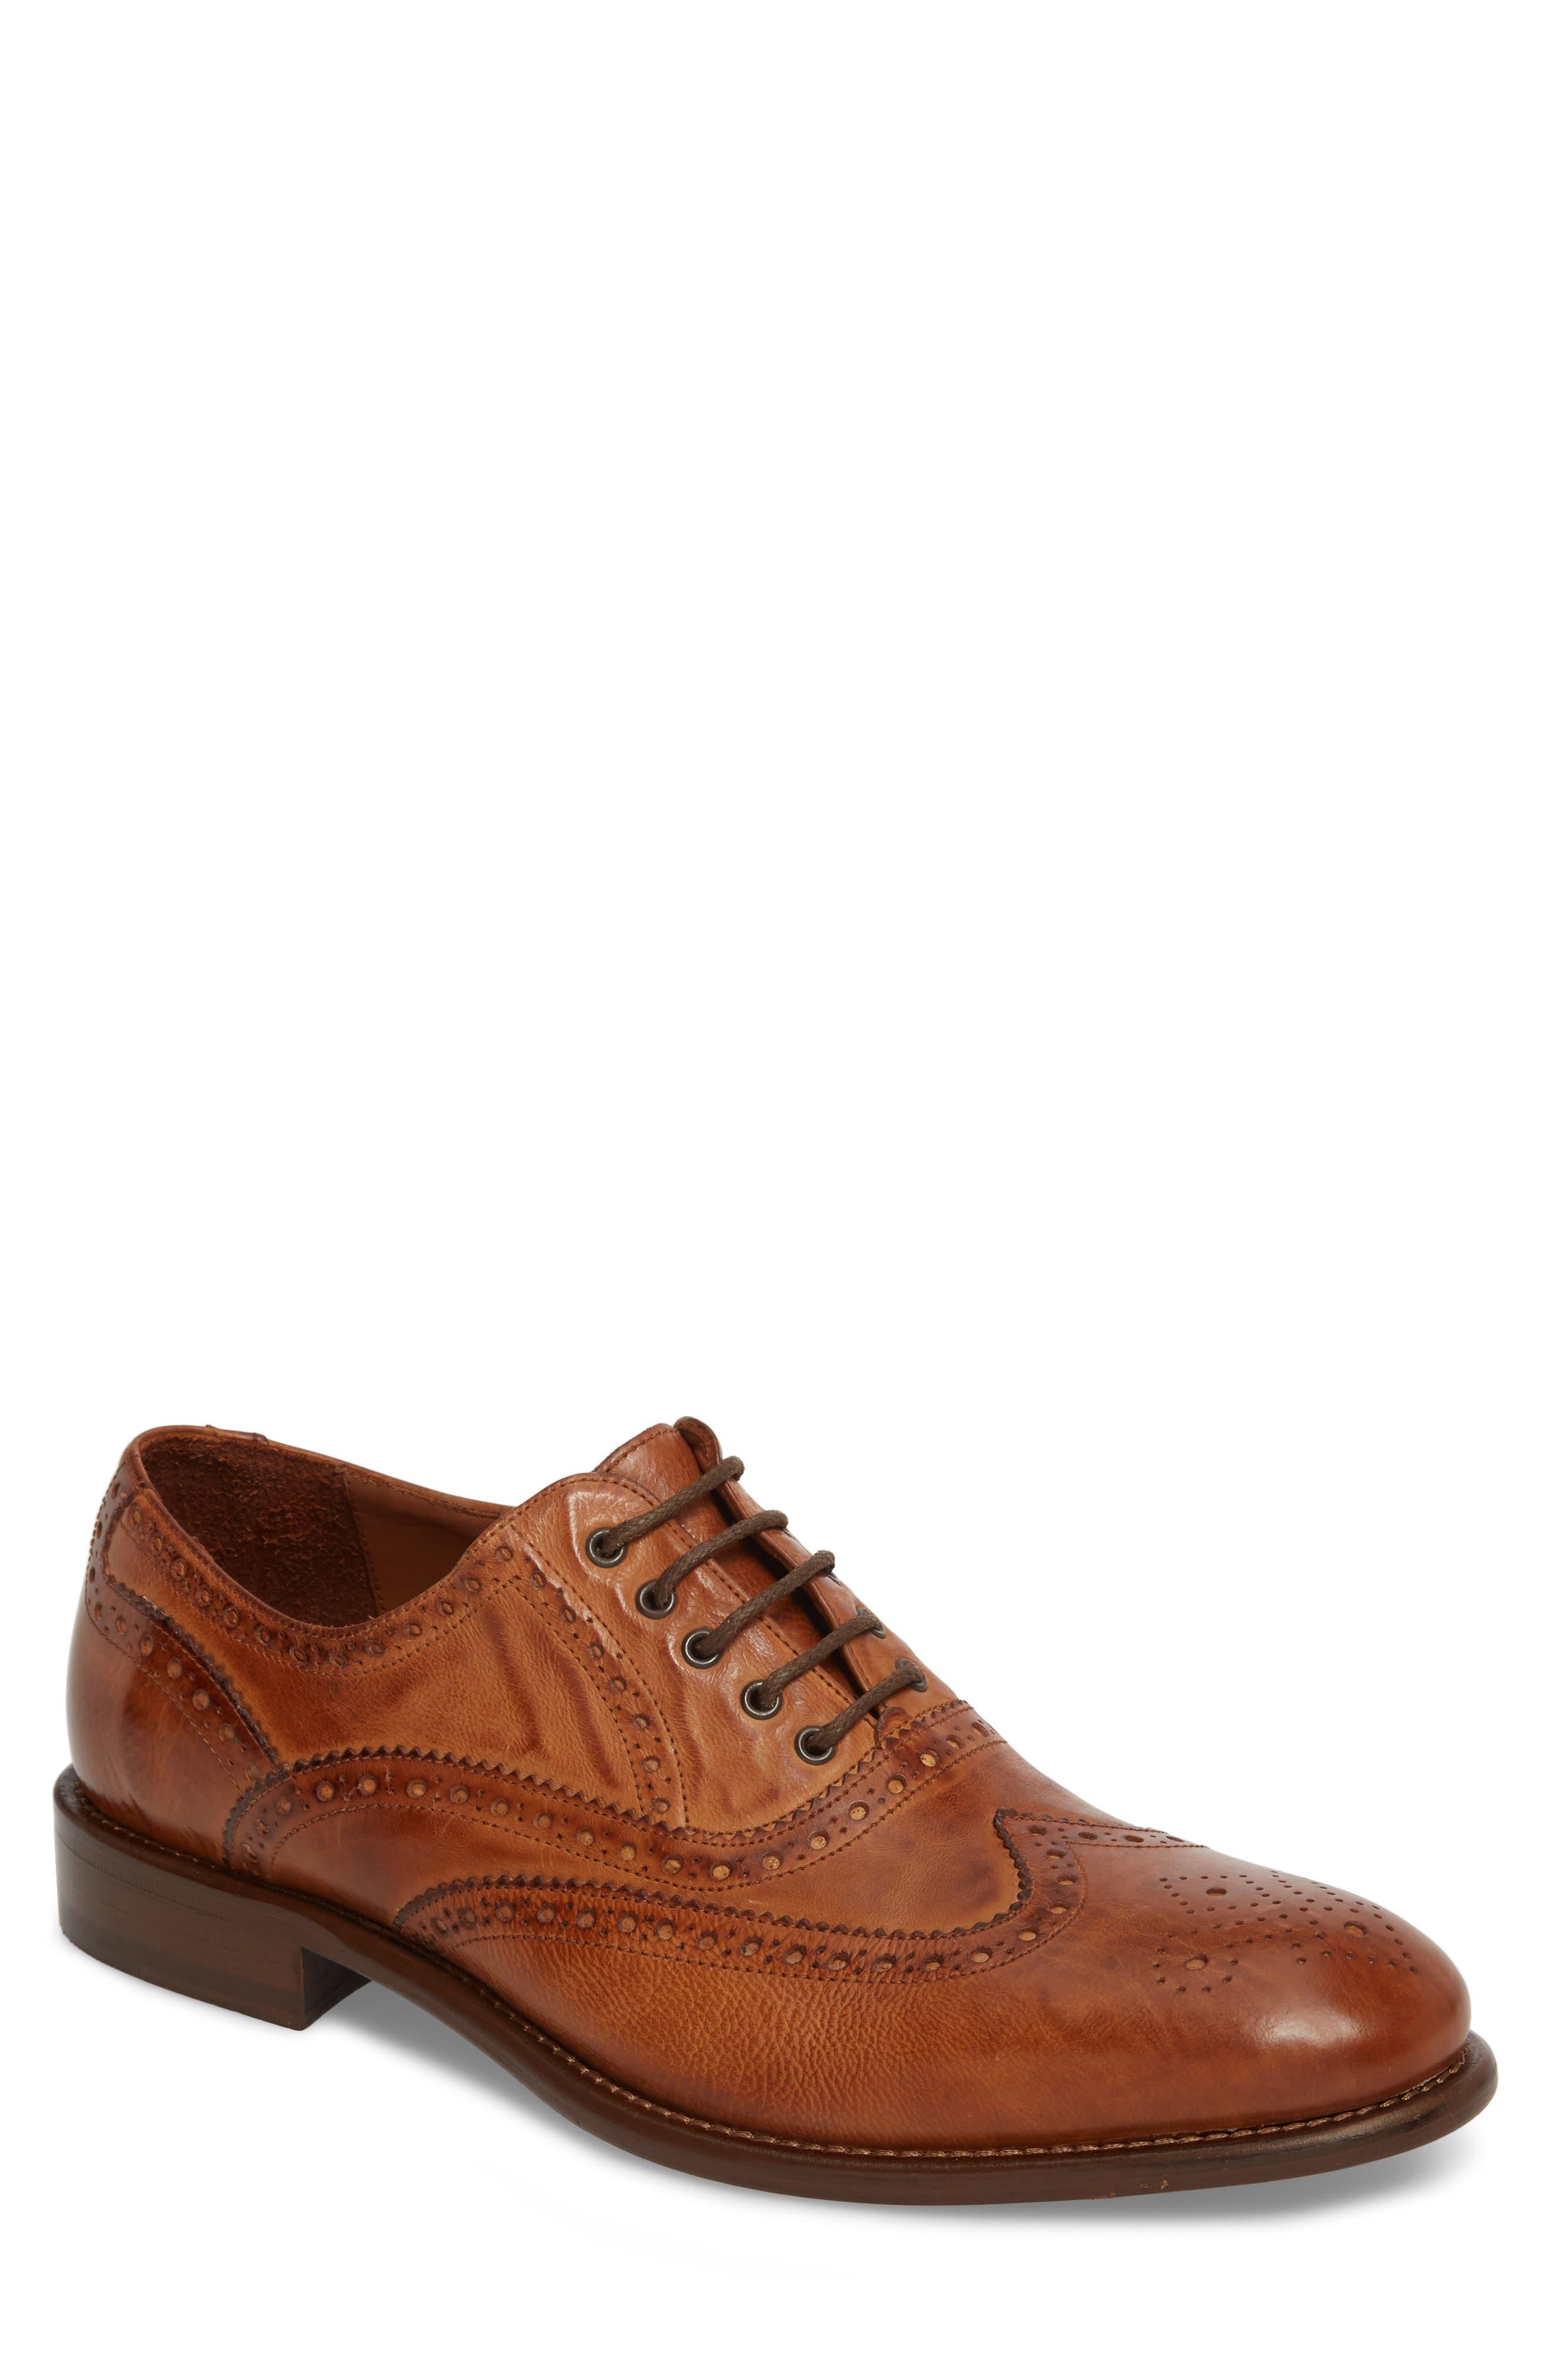 Bryson Wingtip Oxford,                         Main,                         color, Cognac Leather